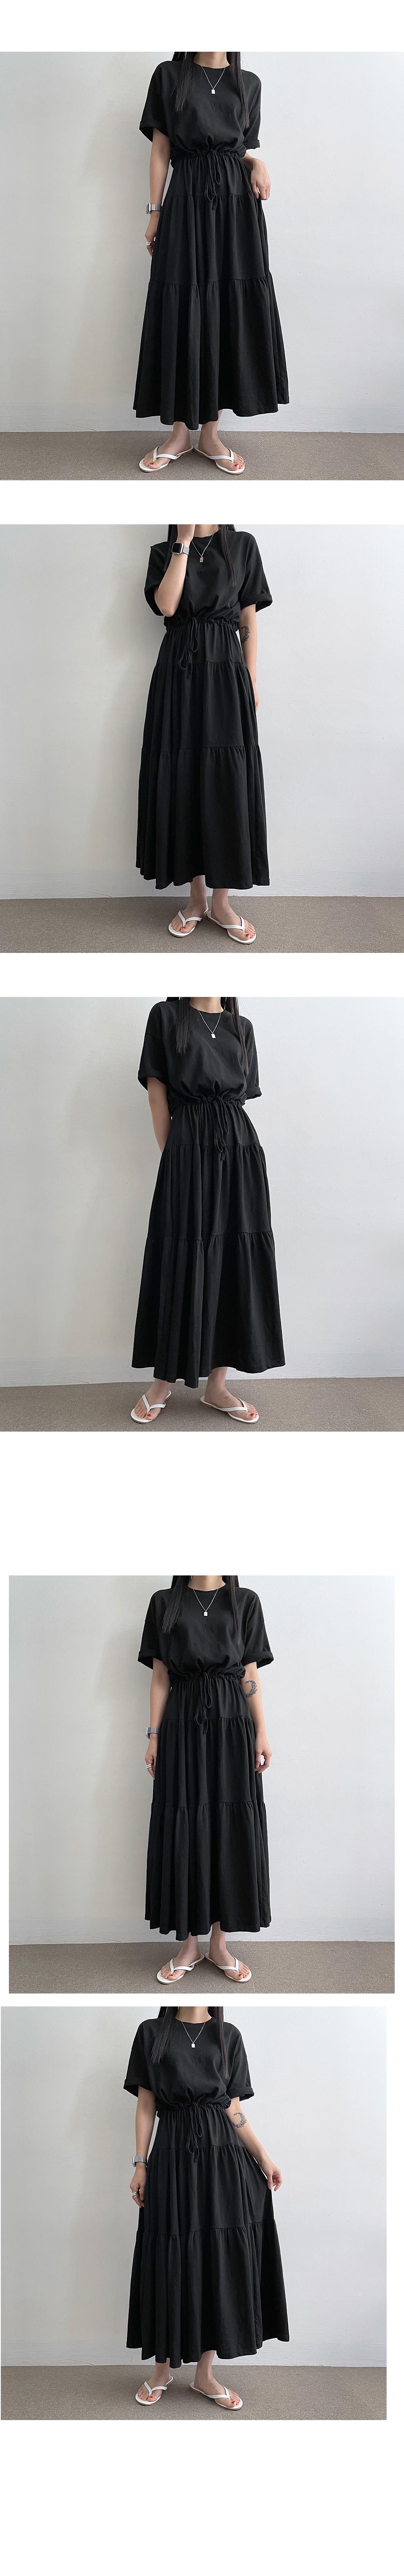 Miyu Cotton Can Kang Short Palong Dress